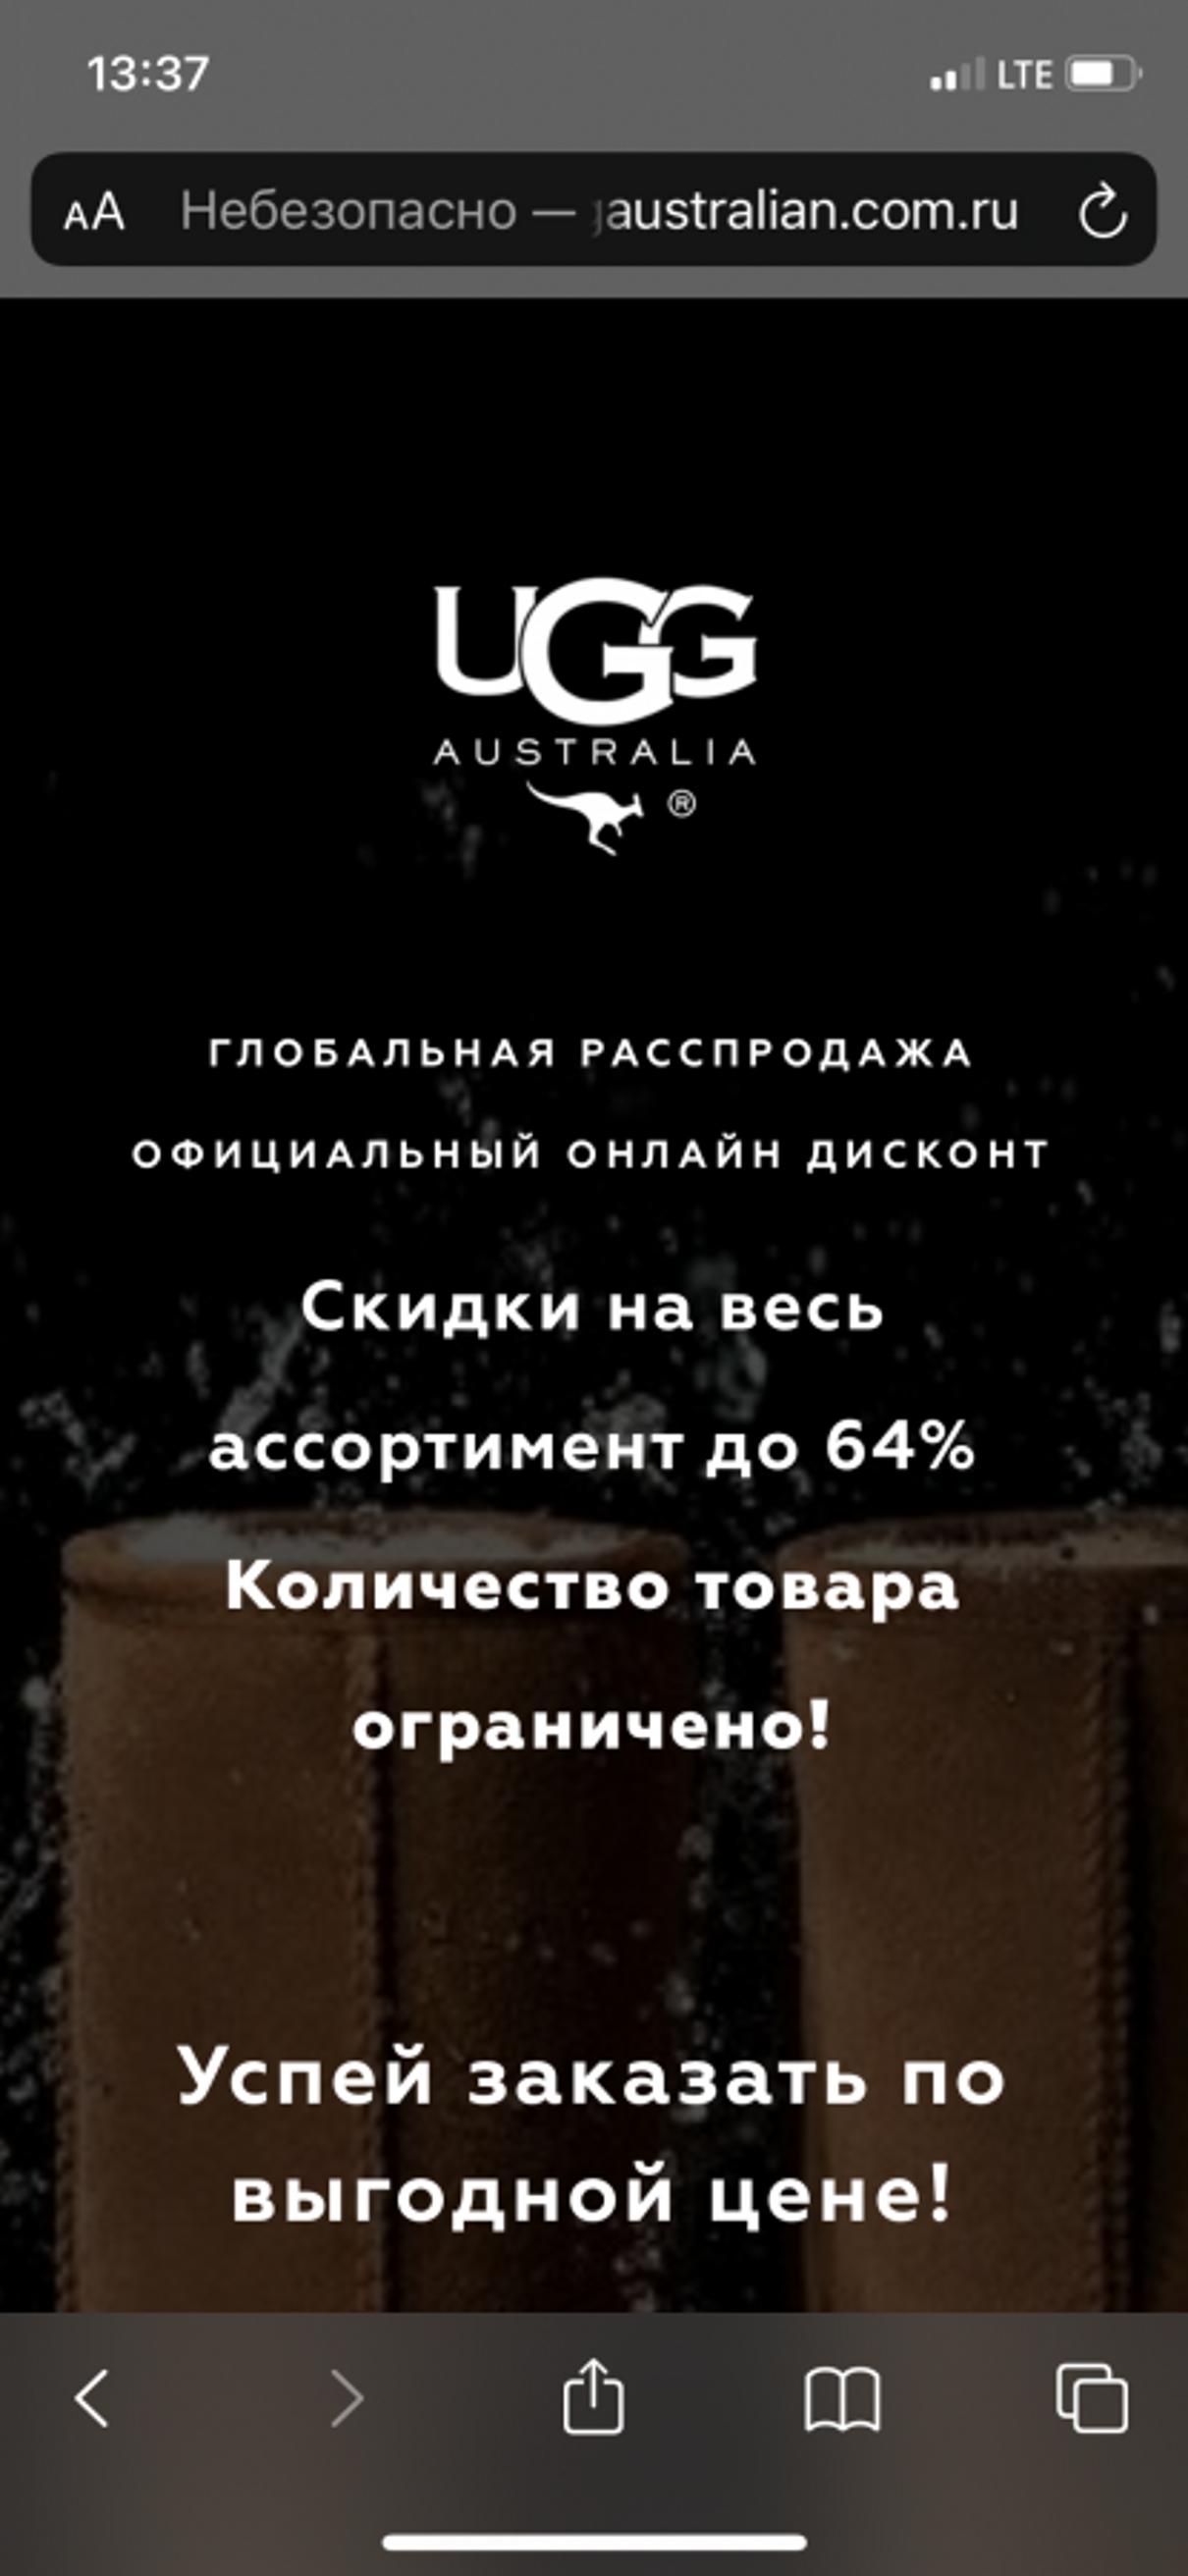 Жалоба-отзыв: Http://uggaustralian.com.ru - Не тот товар.  Фото №3